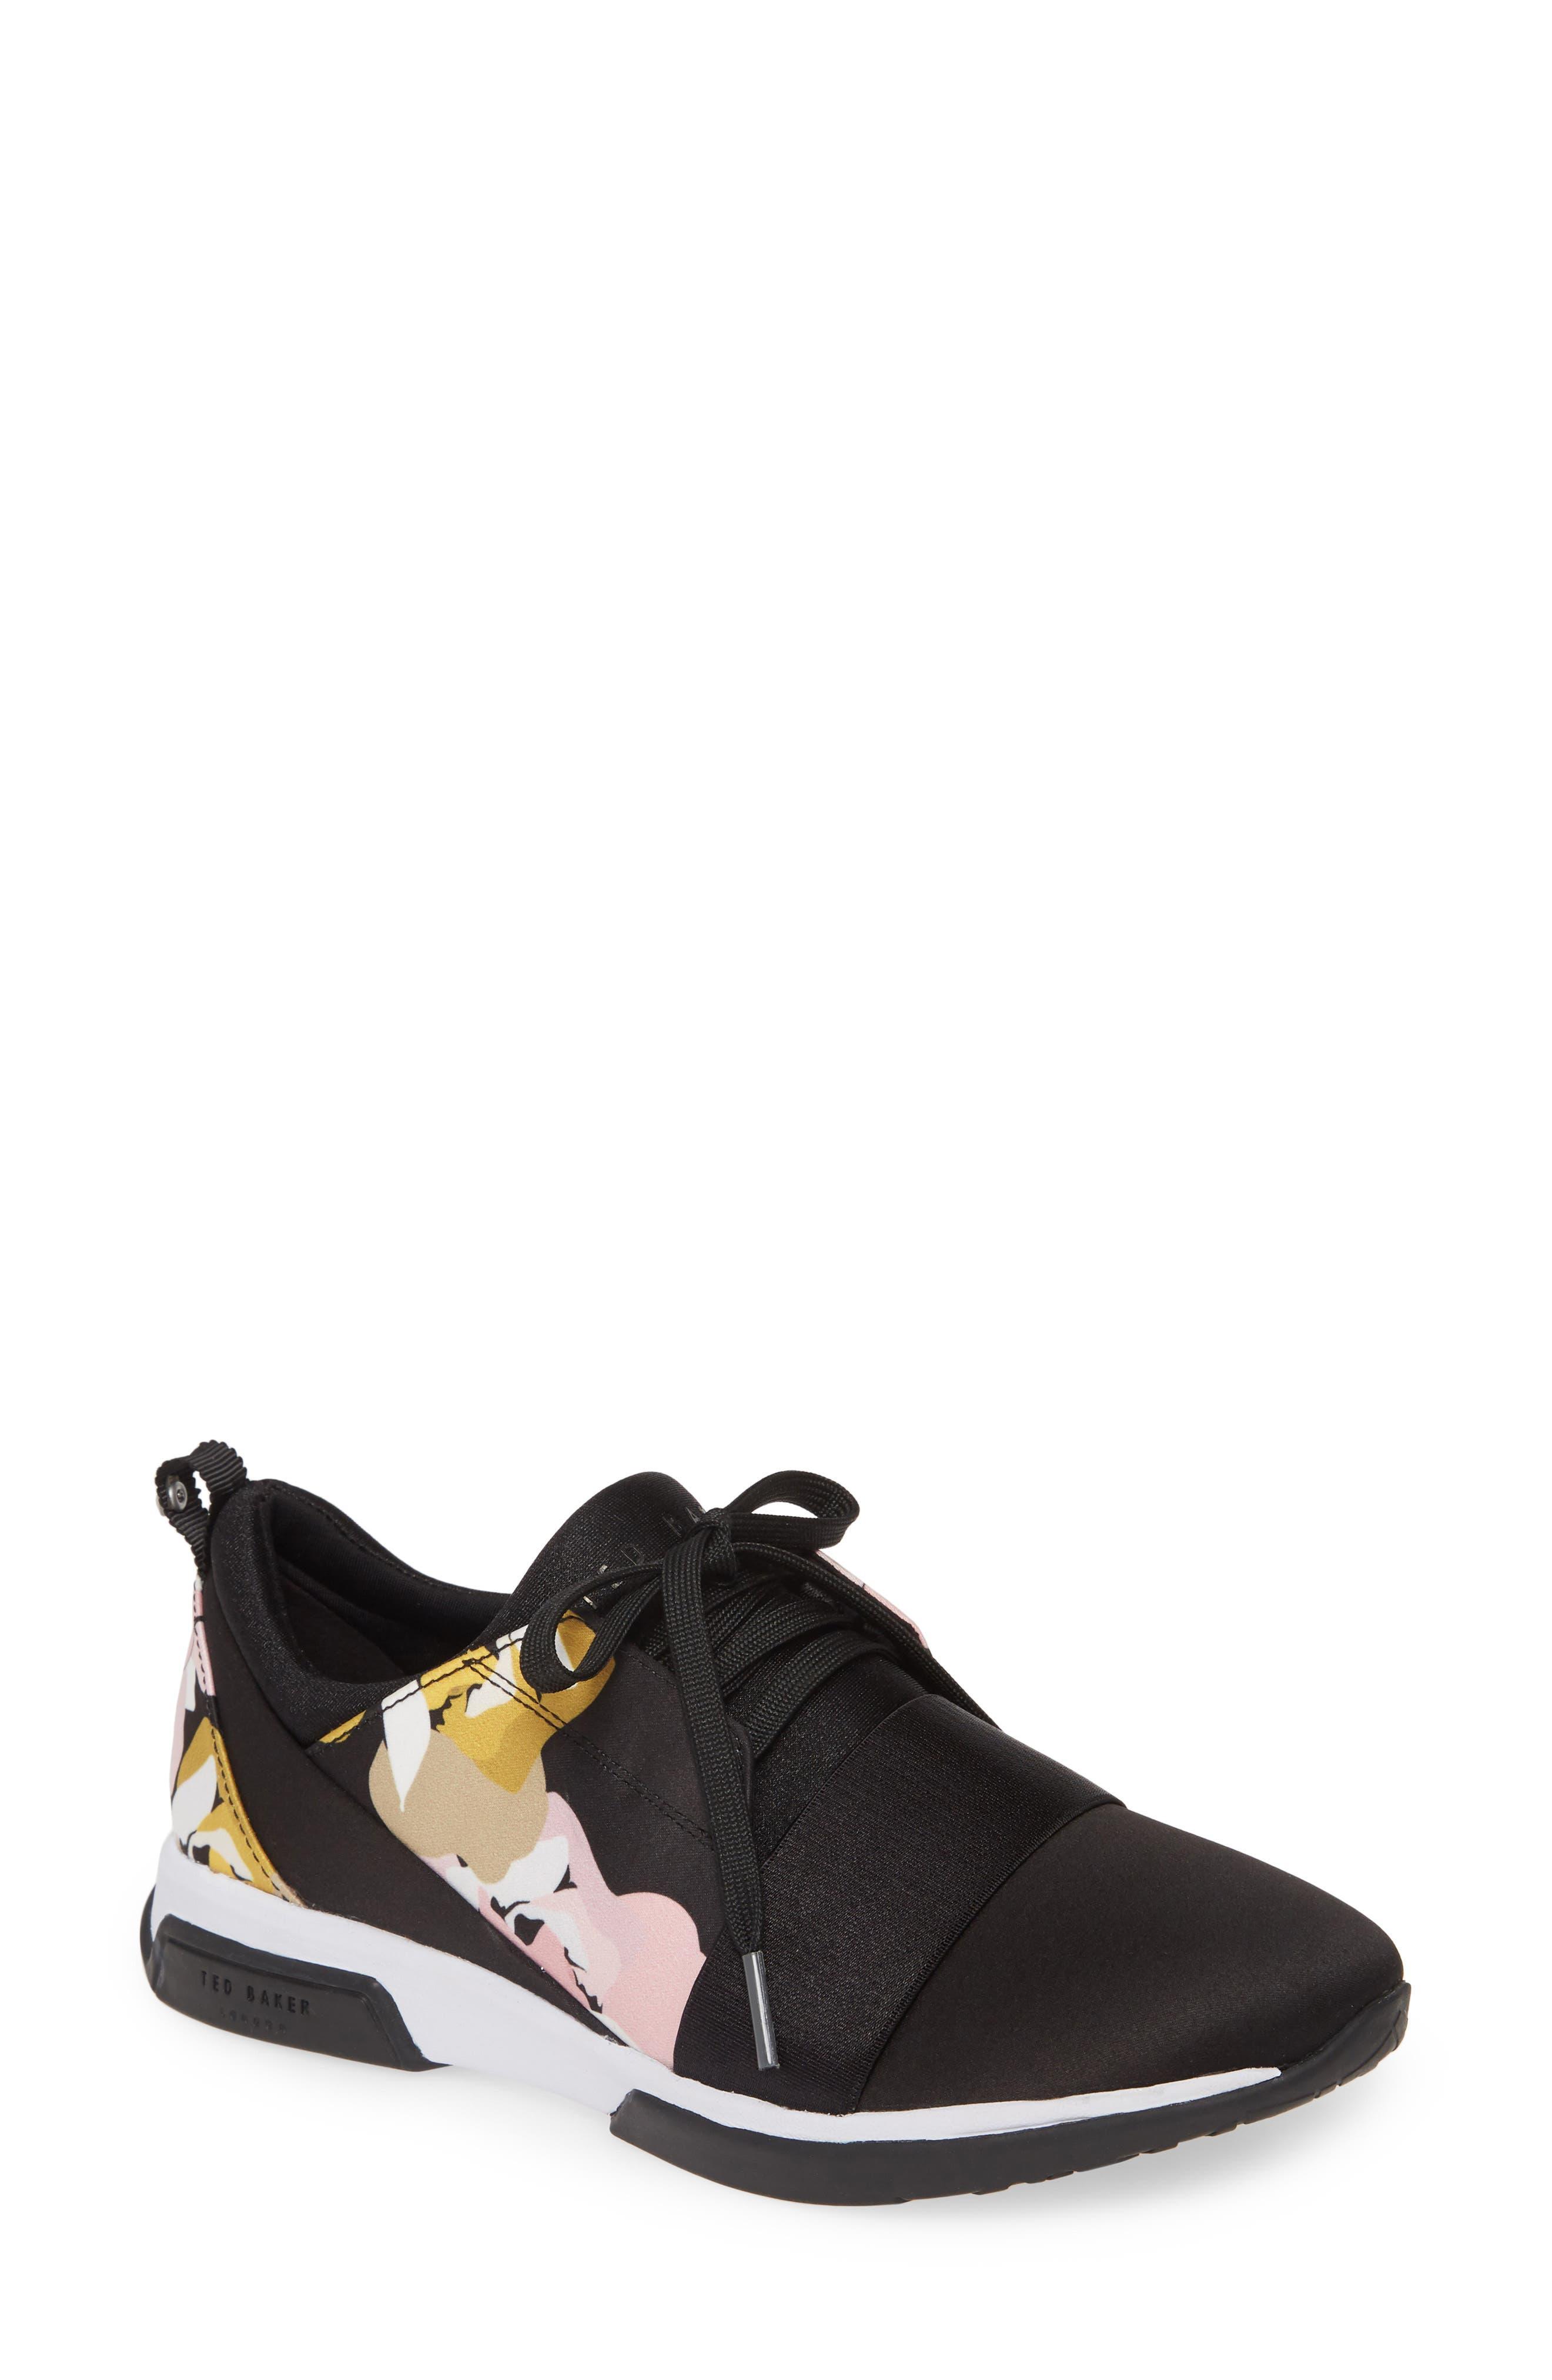 Ted Baker London Cepap Sneaker- Black